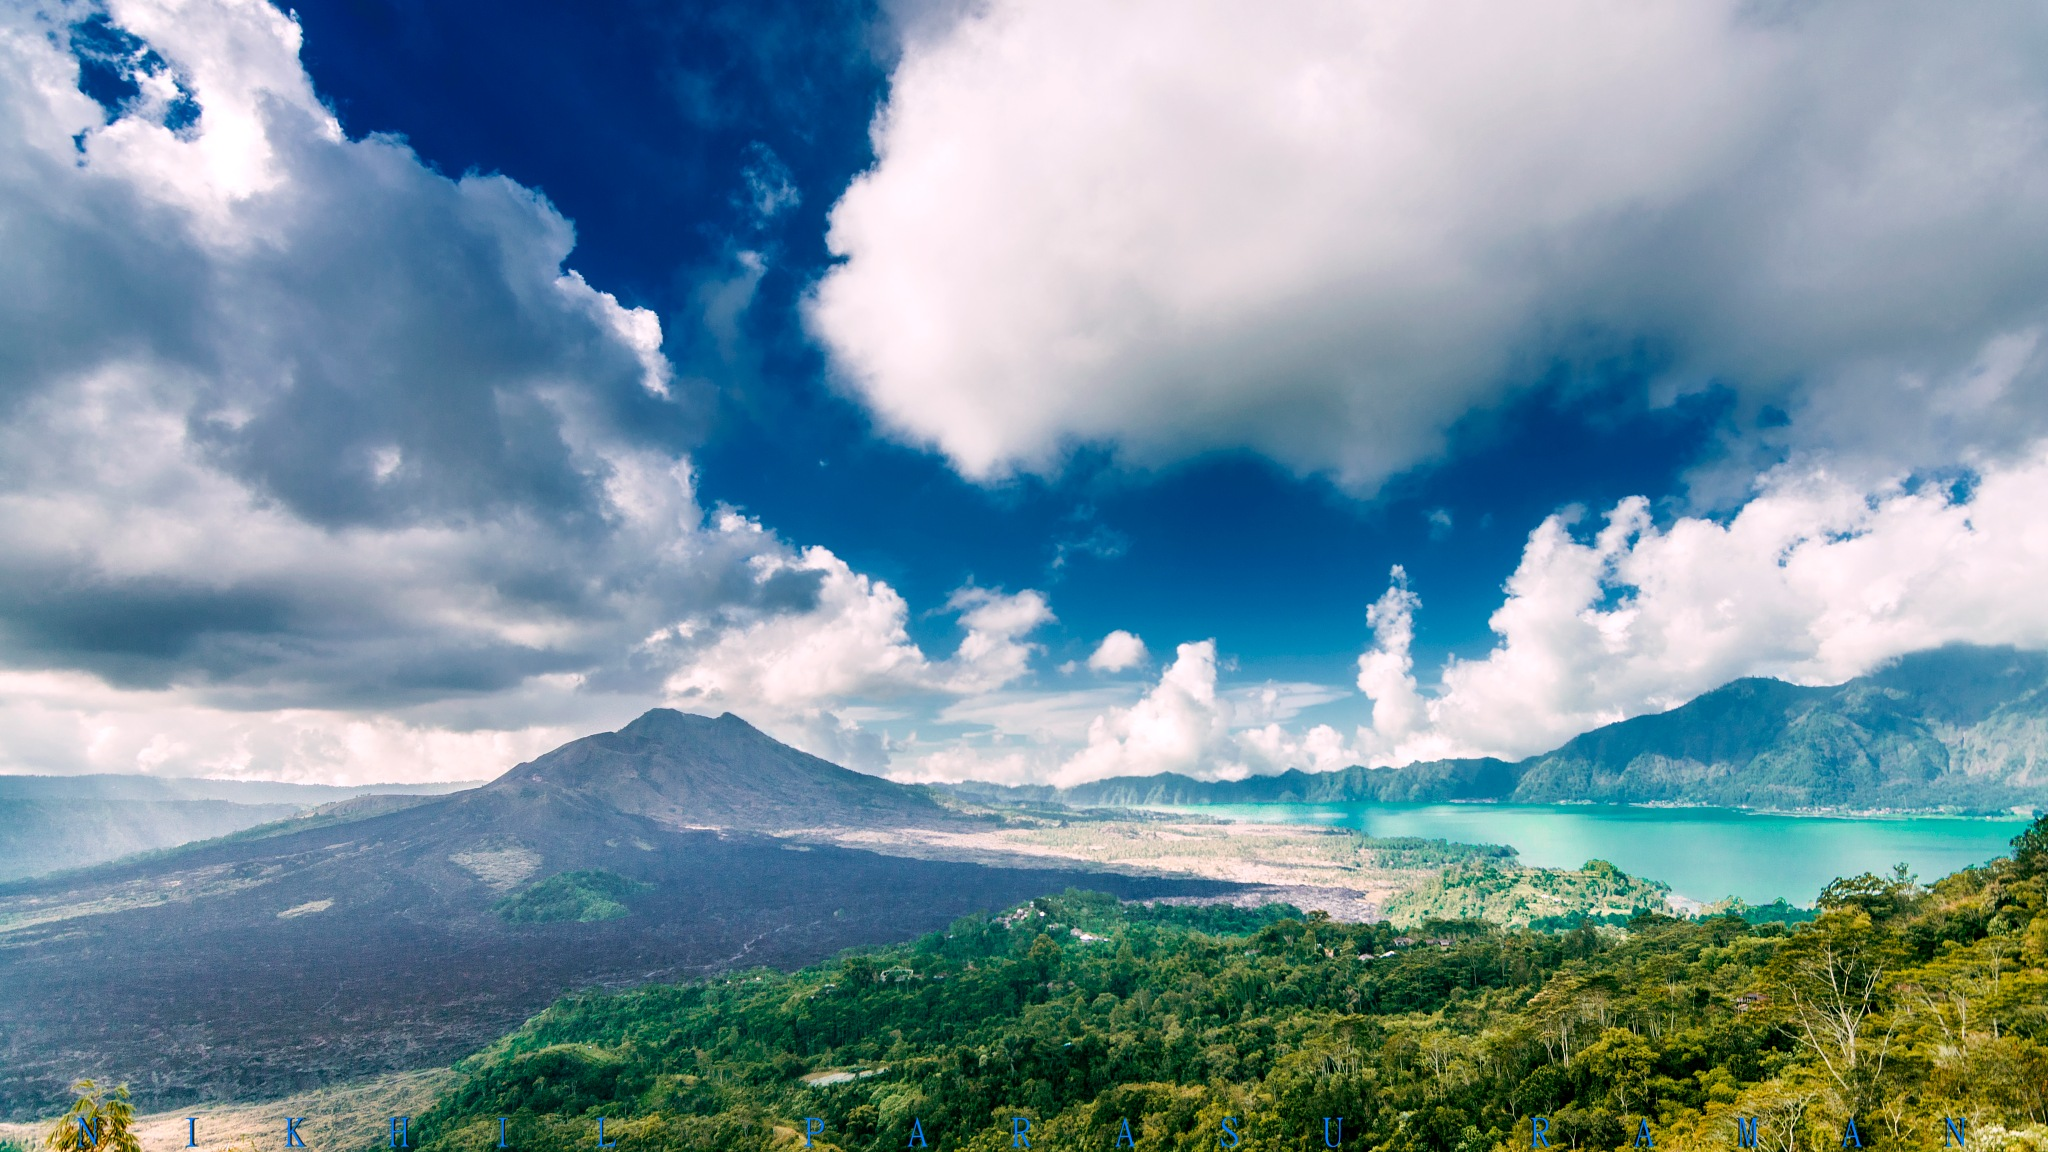 Mount Batur from Kintamani by nikhil1205